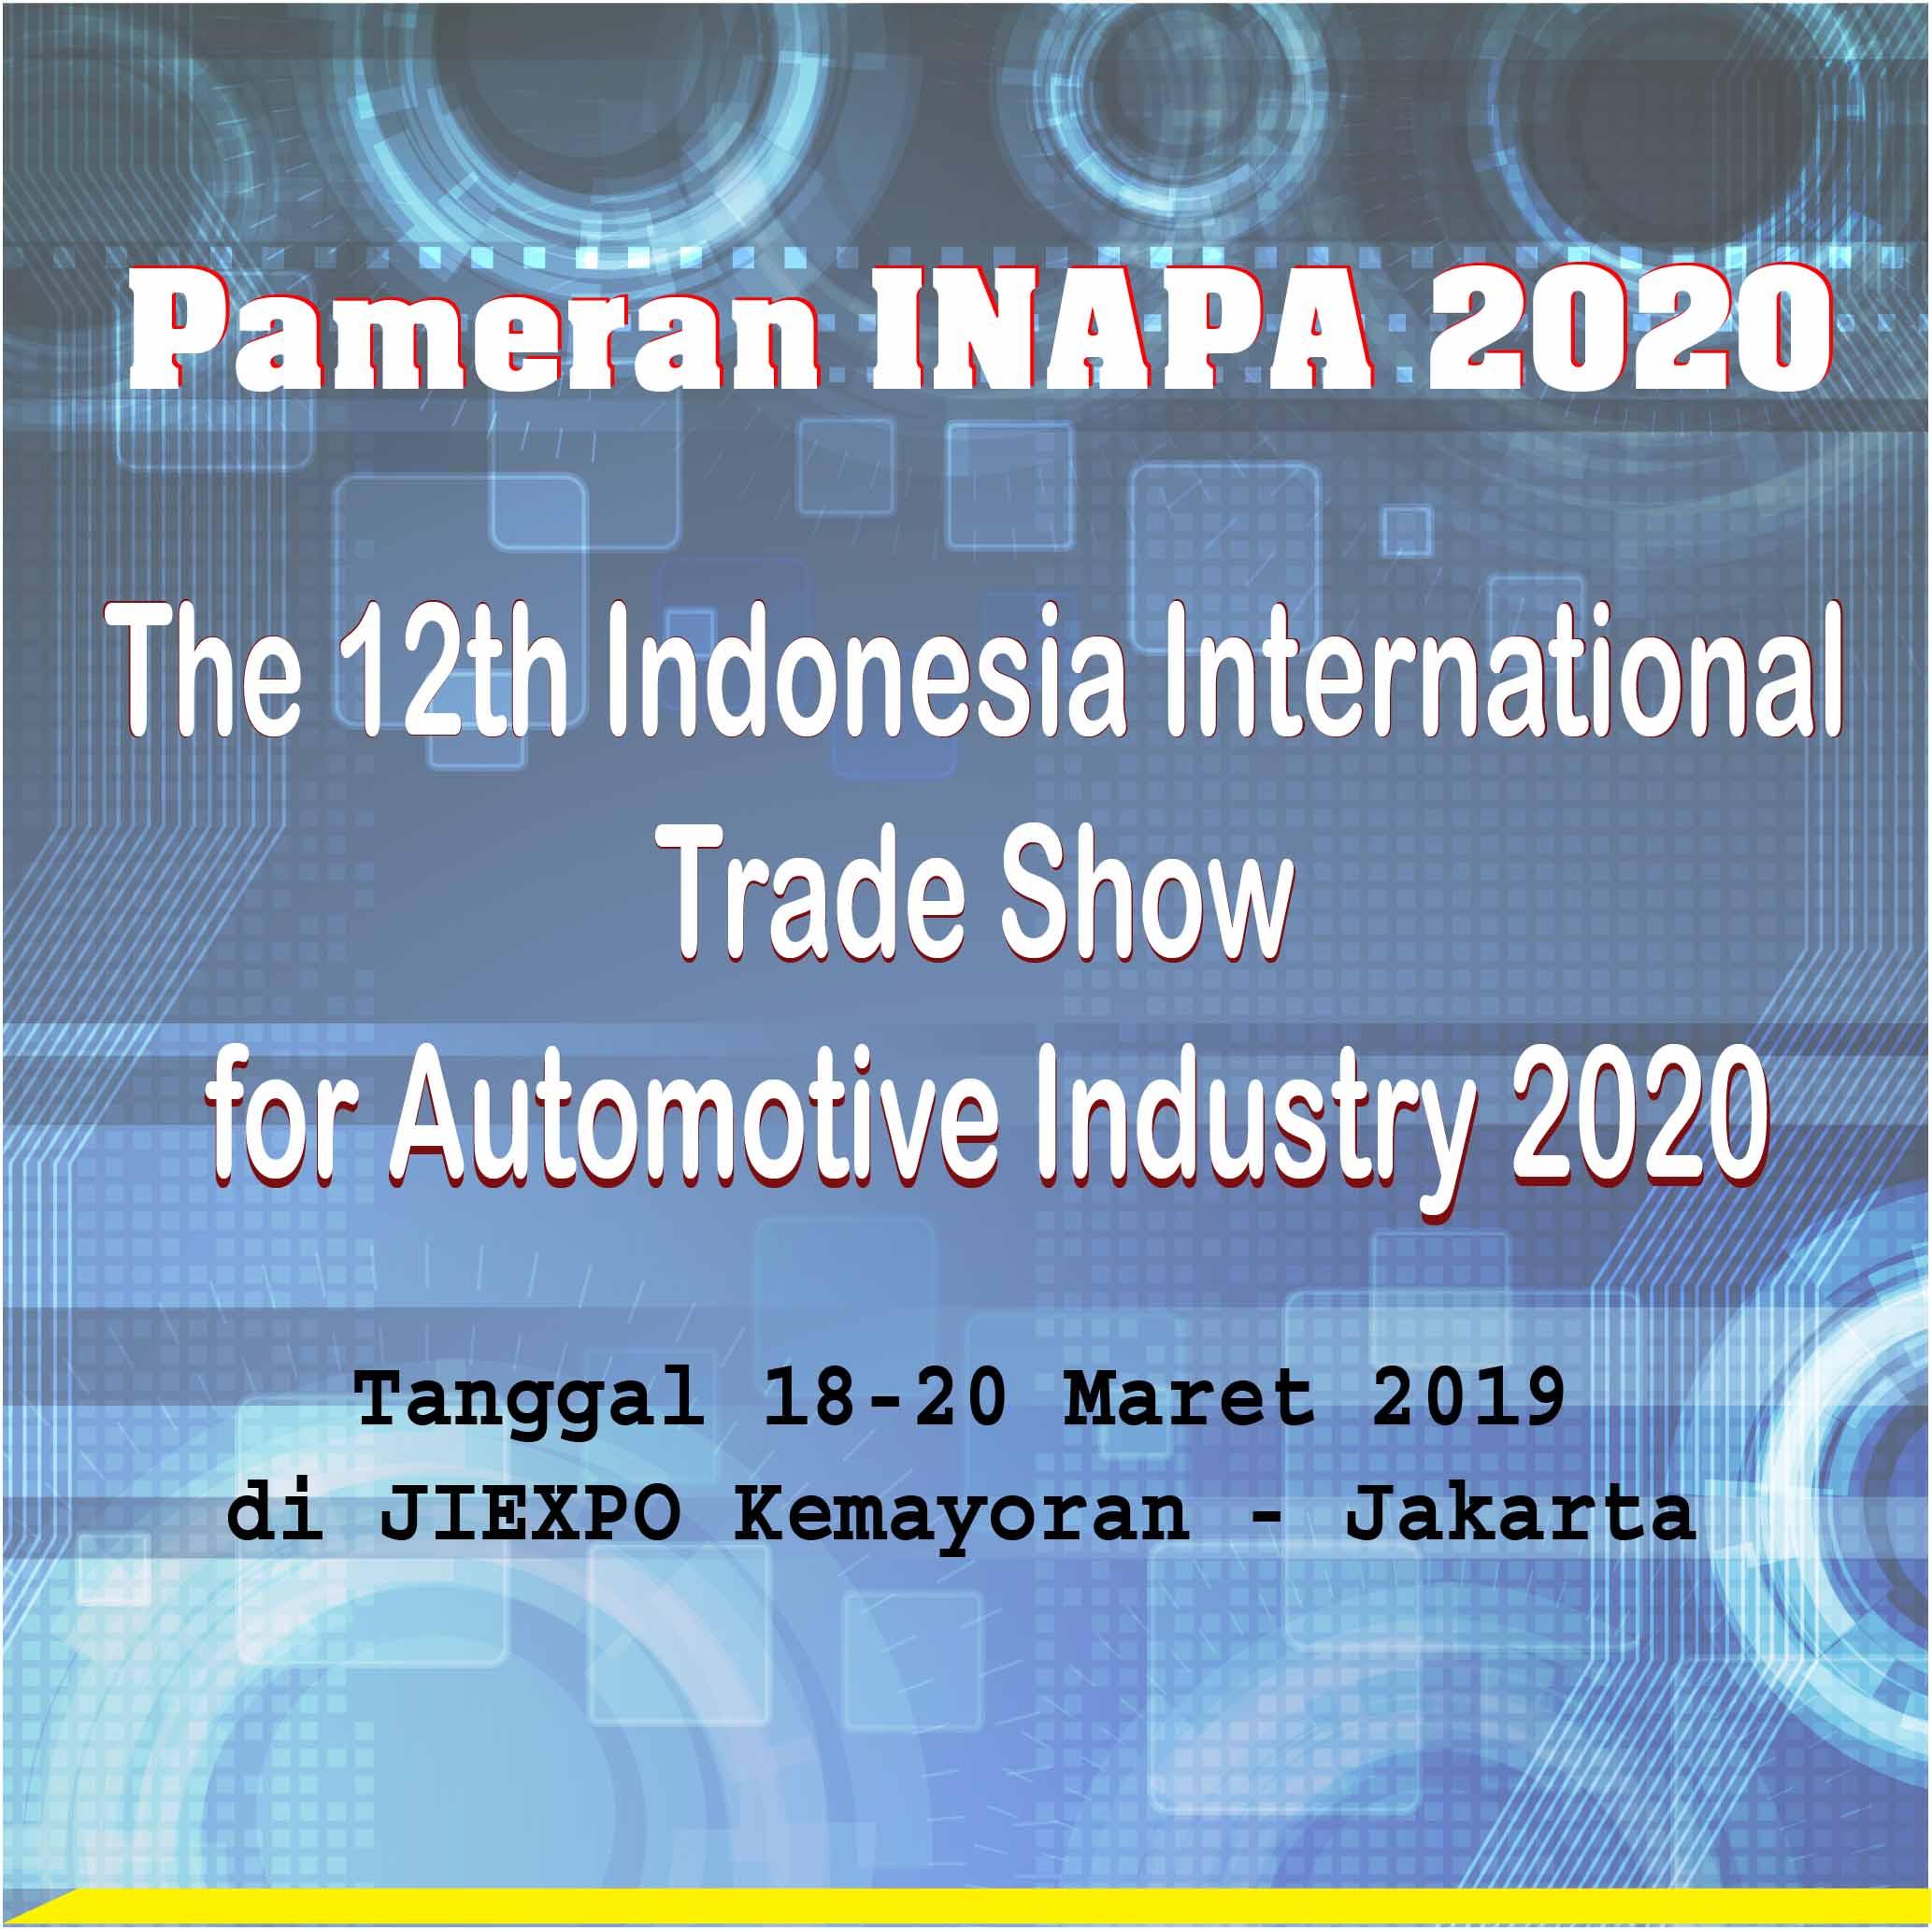 Pameran INAPA 2020, 18-20 Maret 2020 di JIEXPO